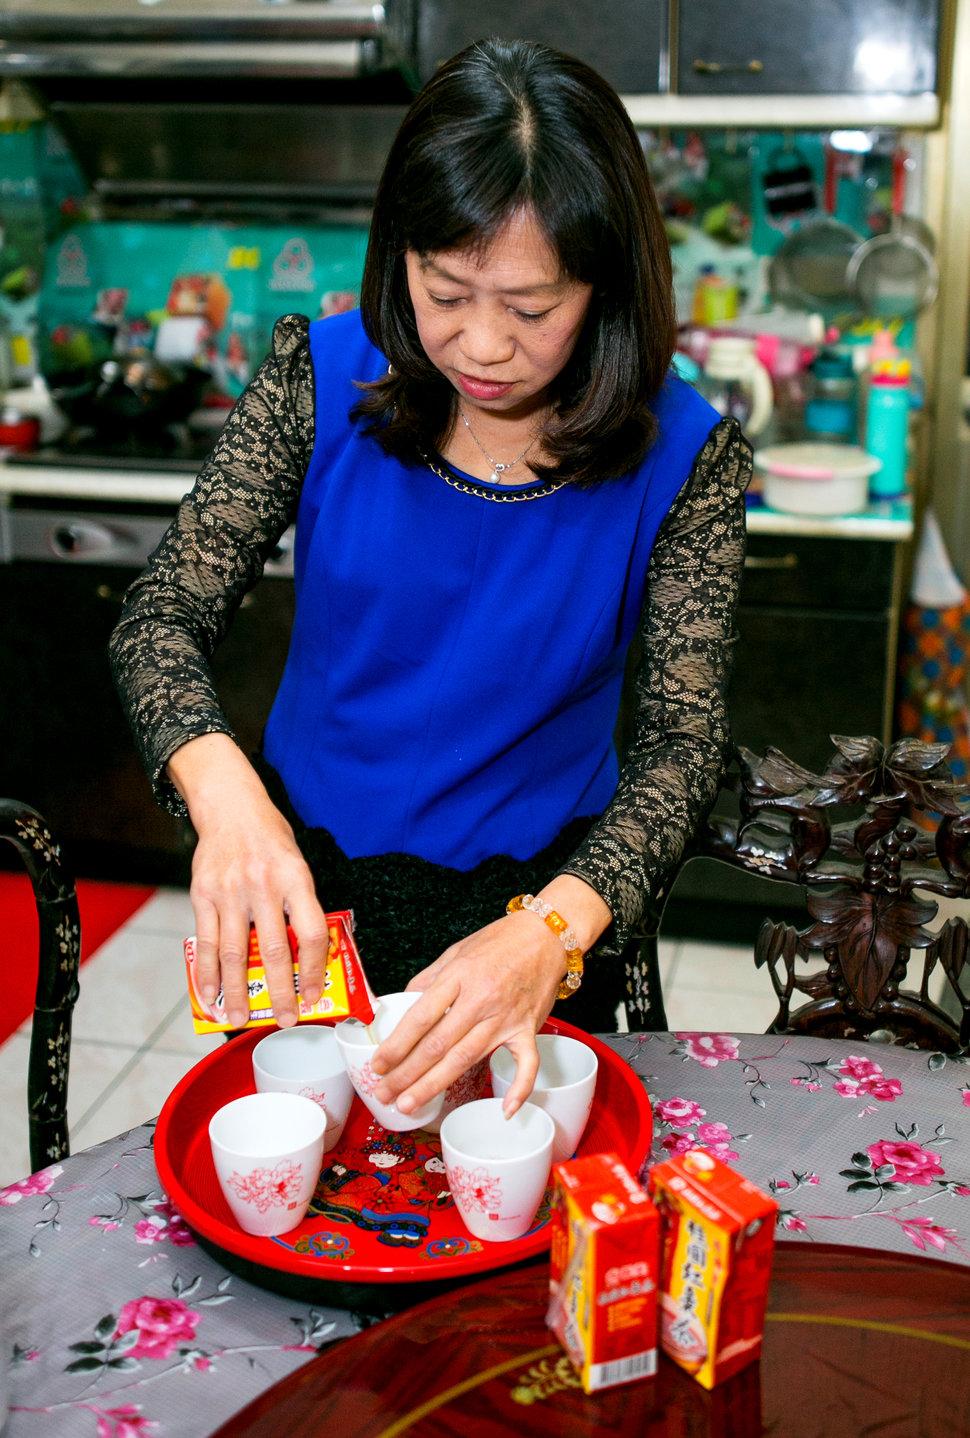 YF2A0732 - Yusin 攝影~與您同心祝福您永結同心 - 結婚吧